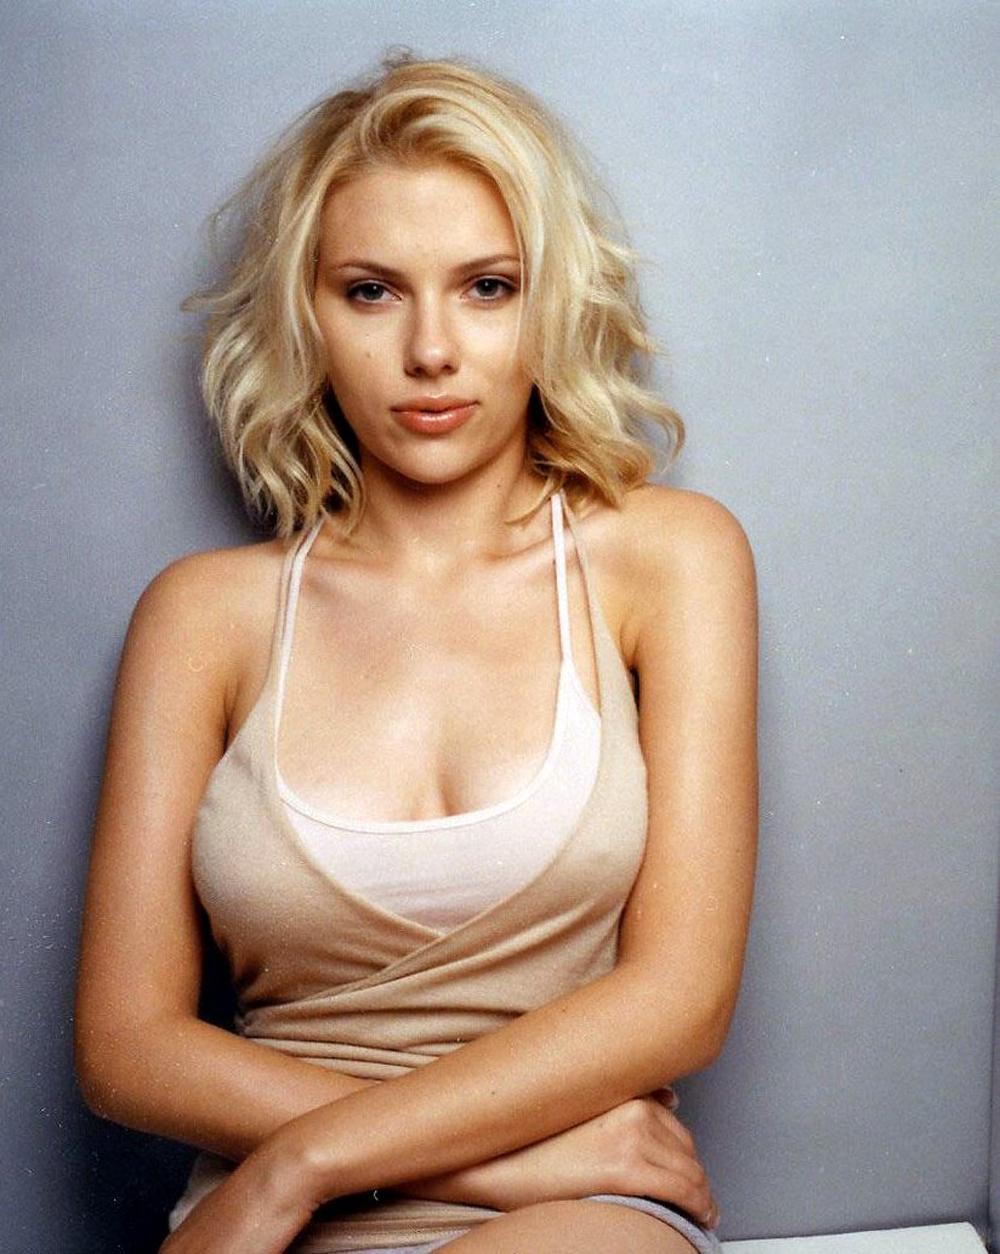 Scarlett johansson new shots e2h entertainment - Scarlett johansson blogspot ...